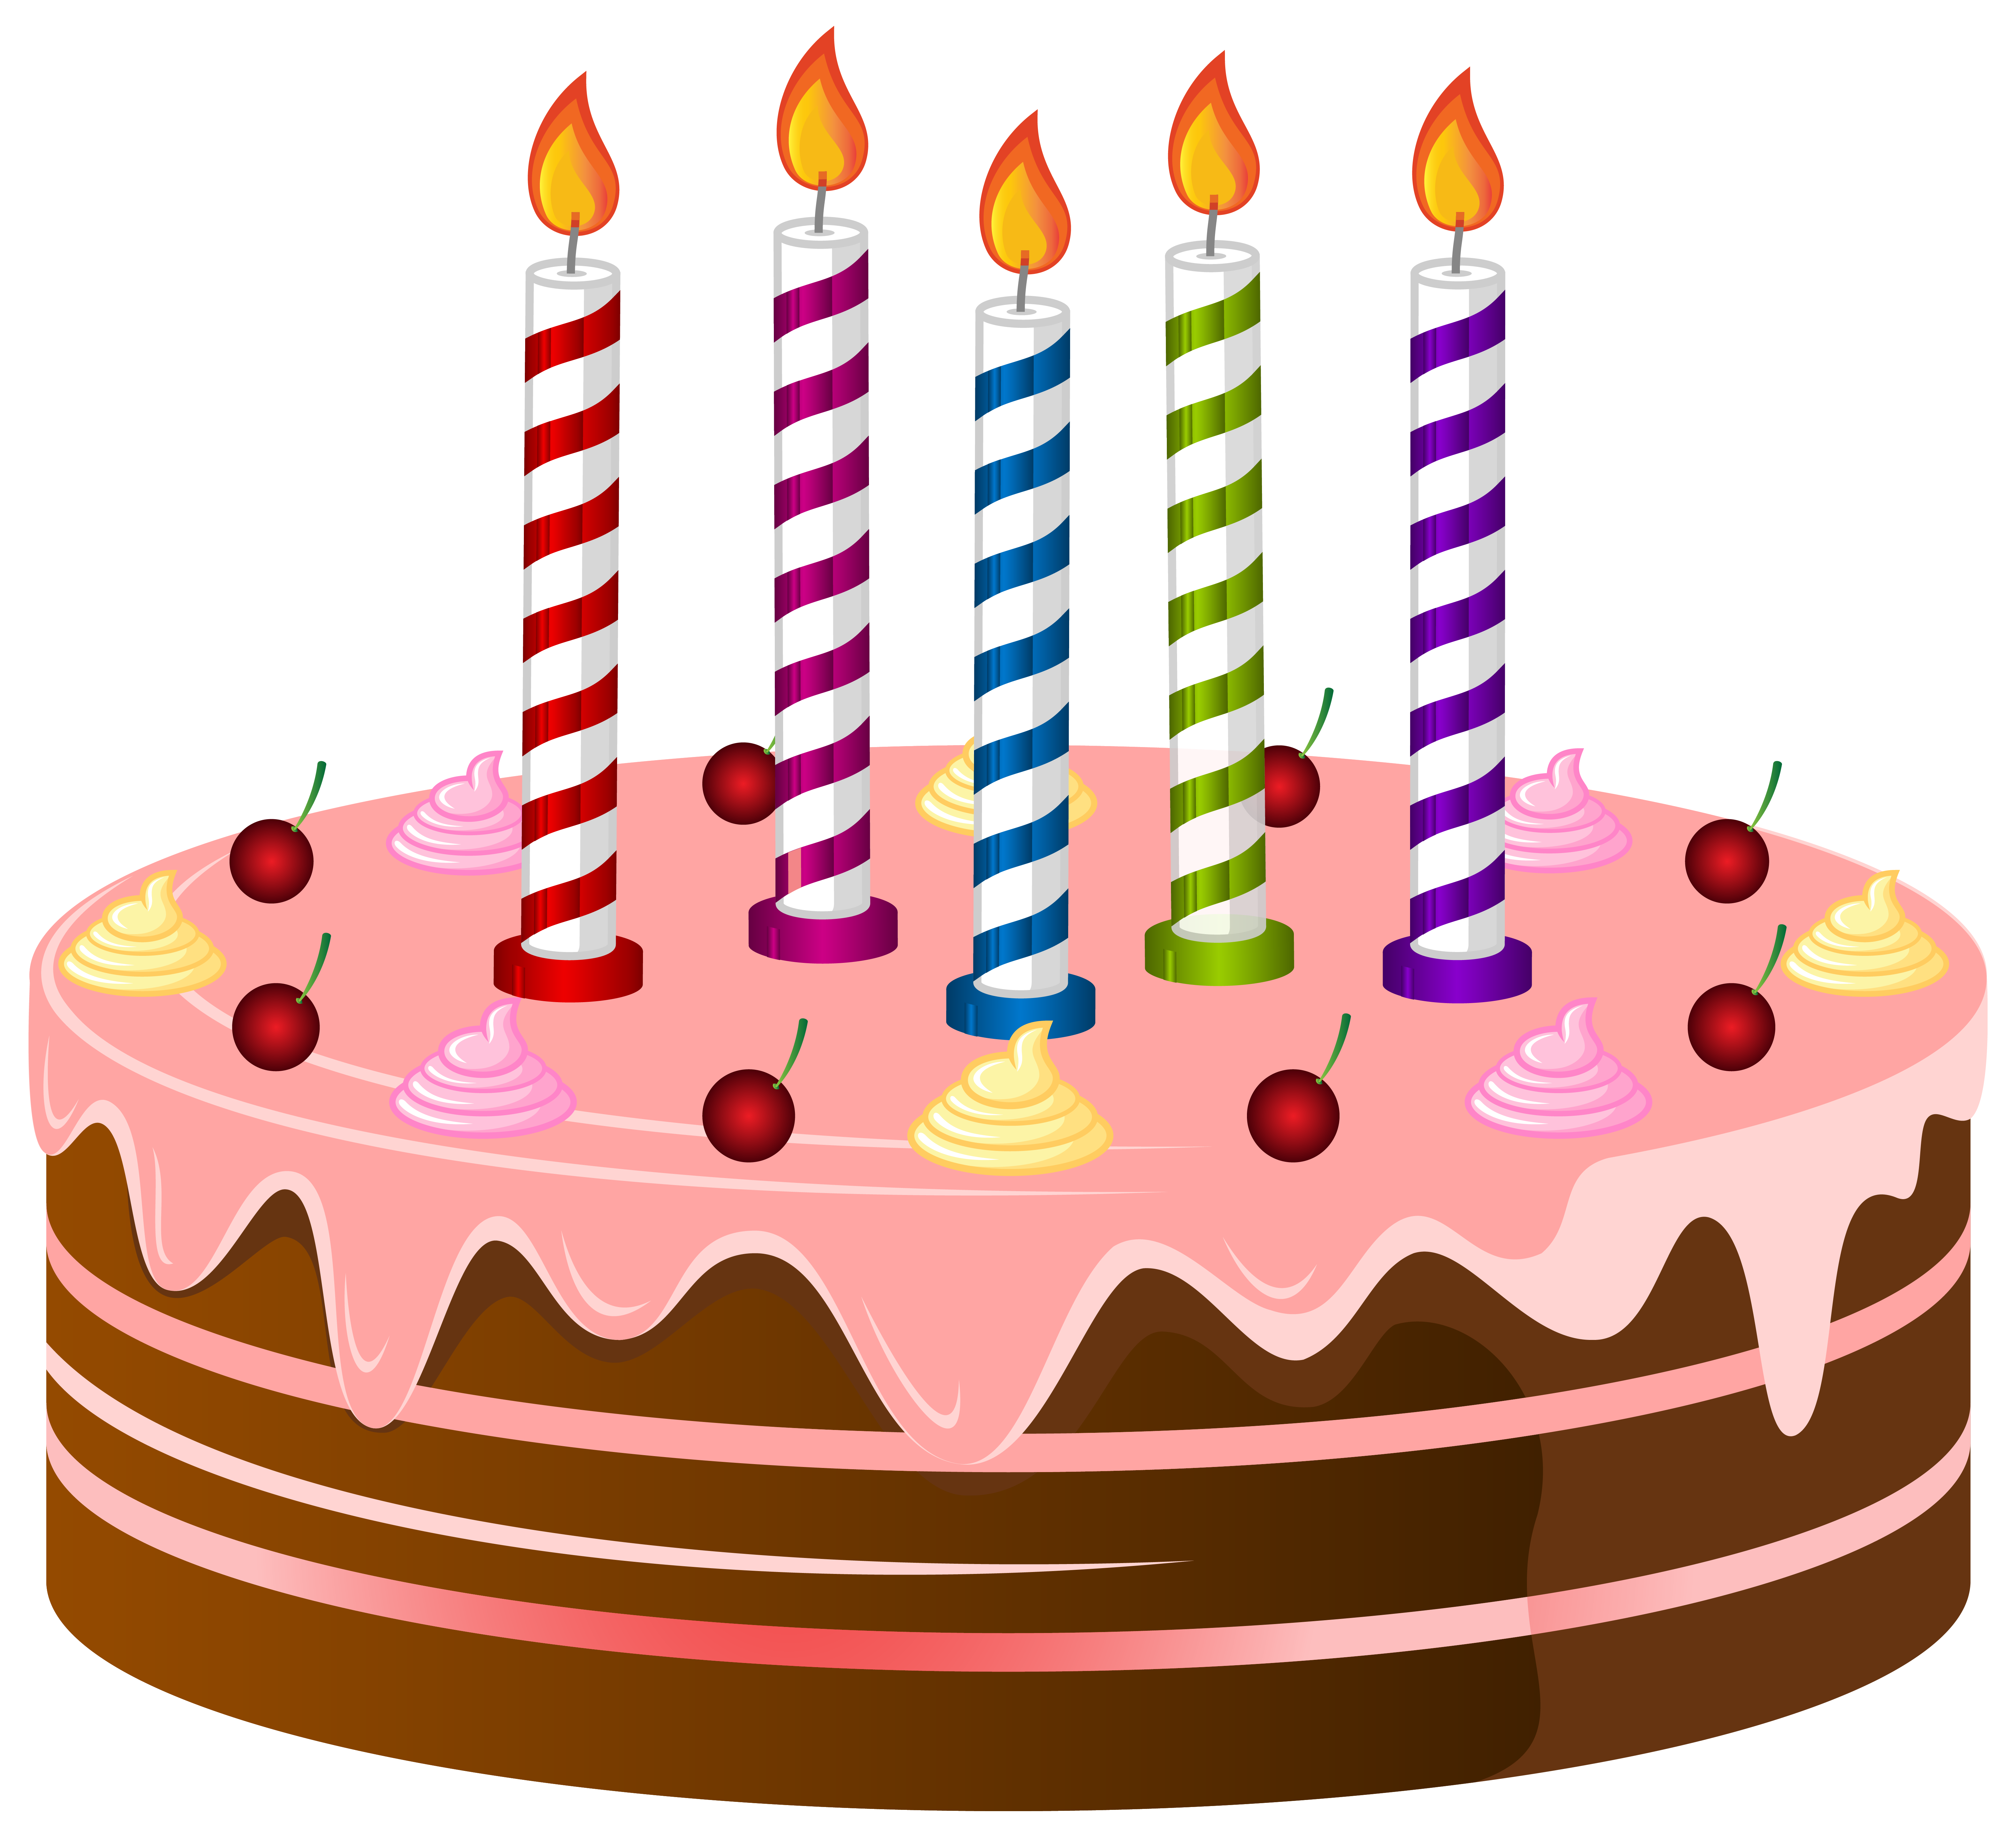 6315x5754 Halloween Birthday Cake Clipart